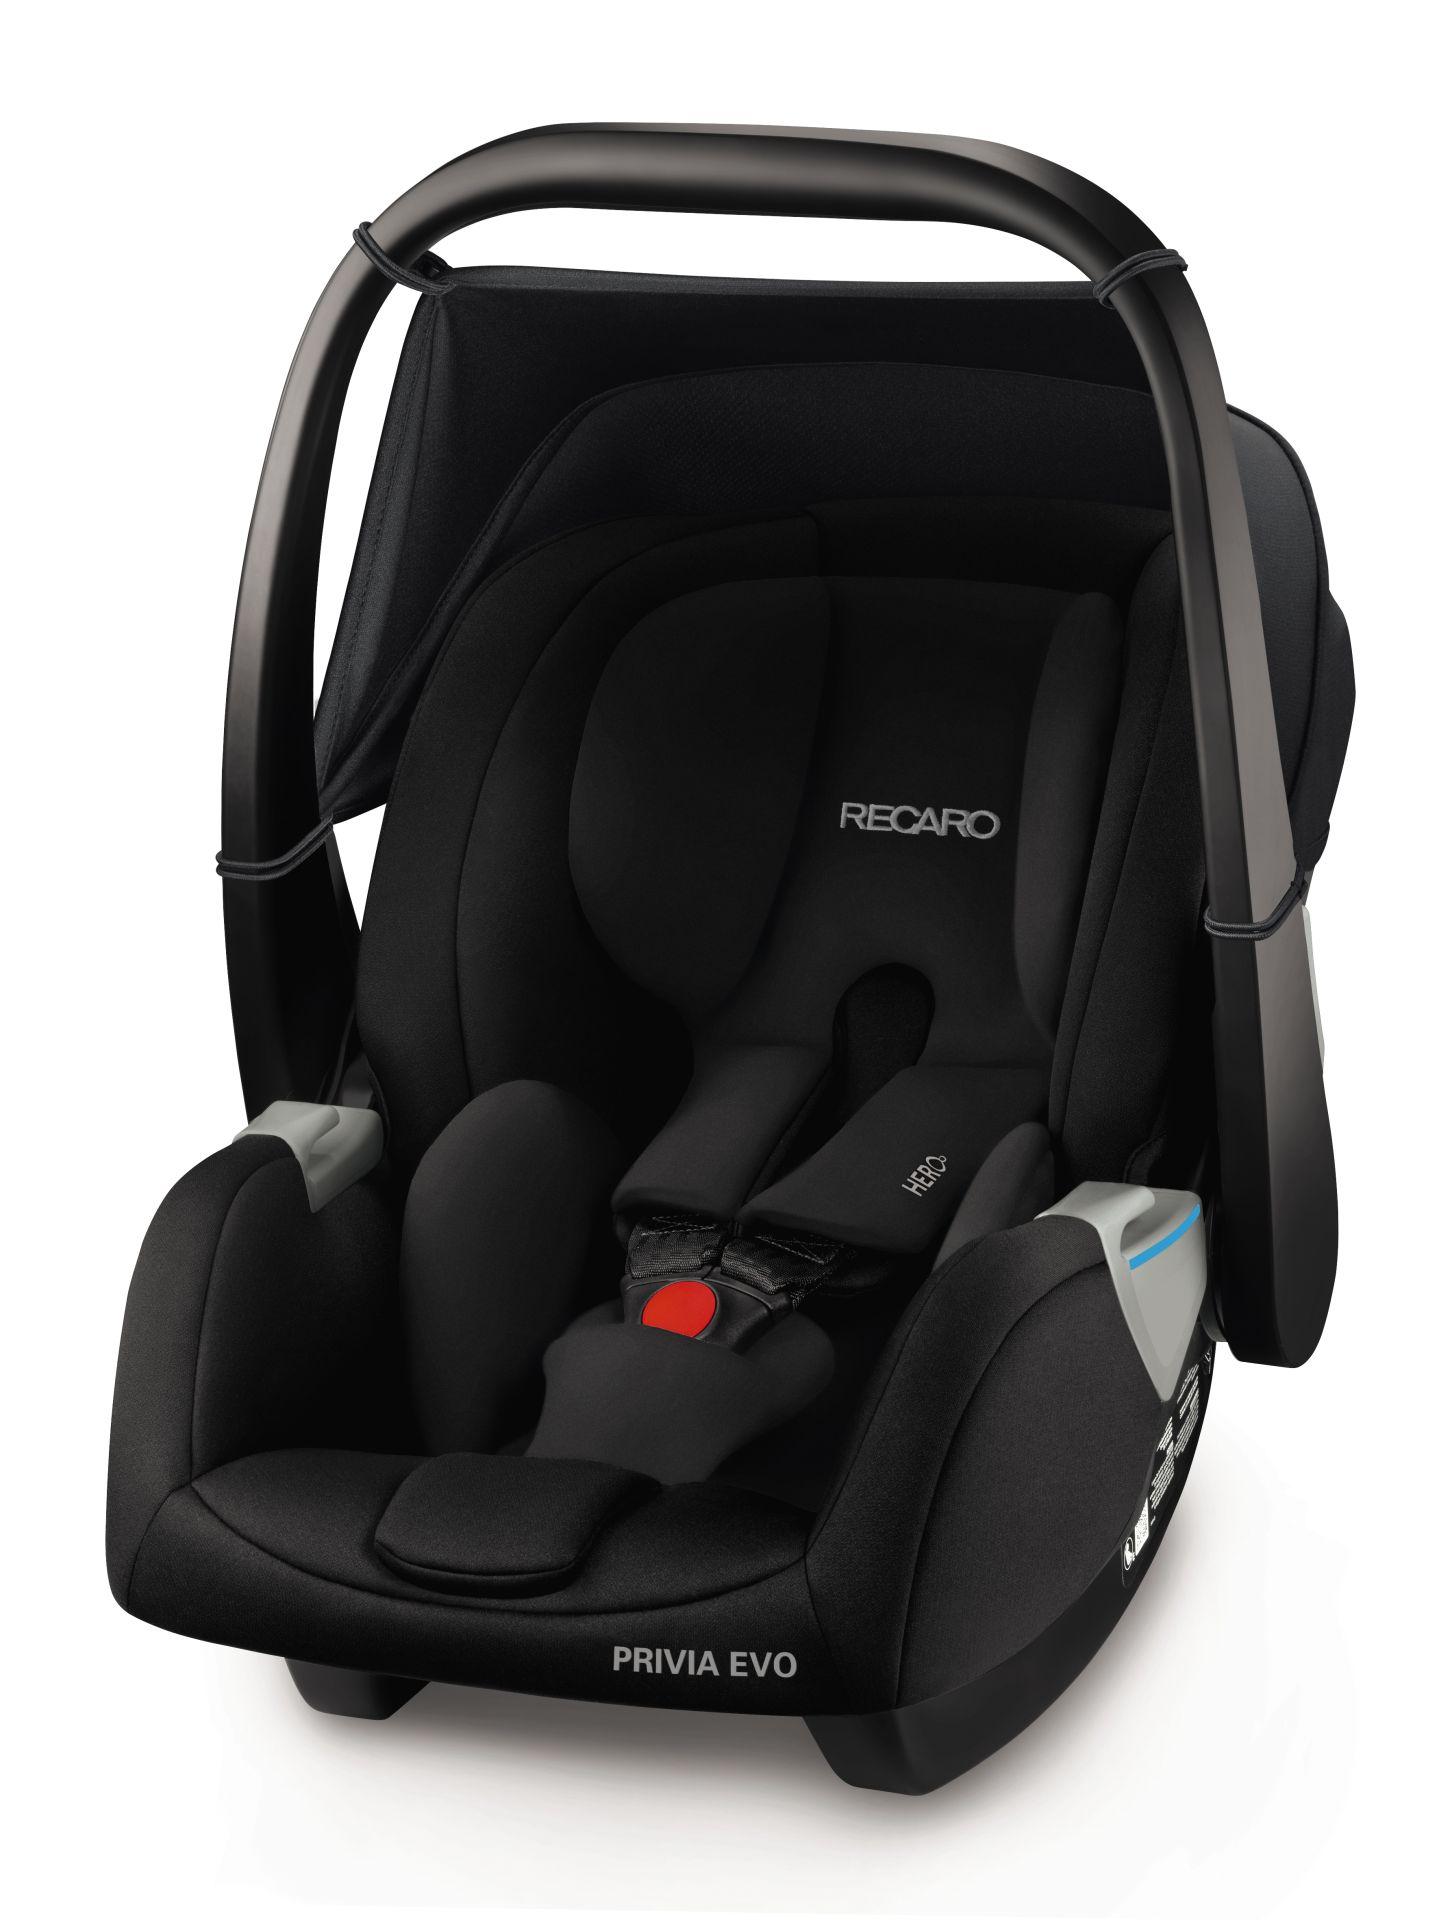 recaro infant car seat privio evo 2018 performance black buy at kidsroom car seats. Black Bedroom Furniture Sets. Home Design Ideas